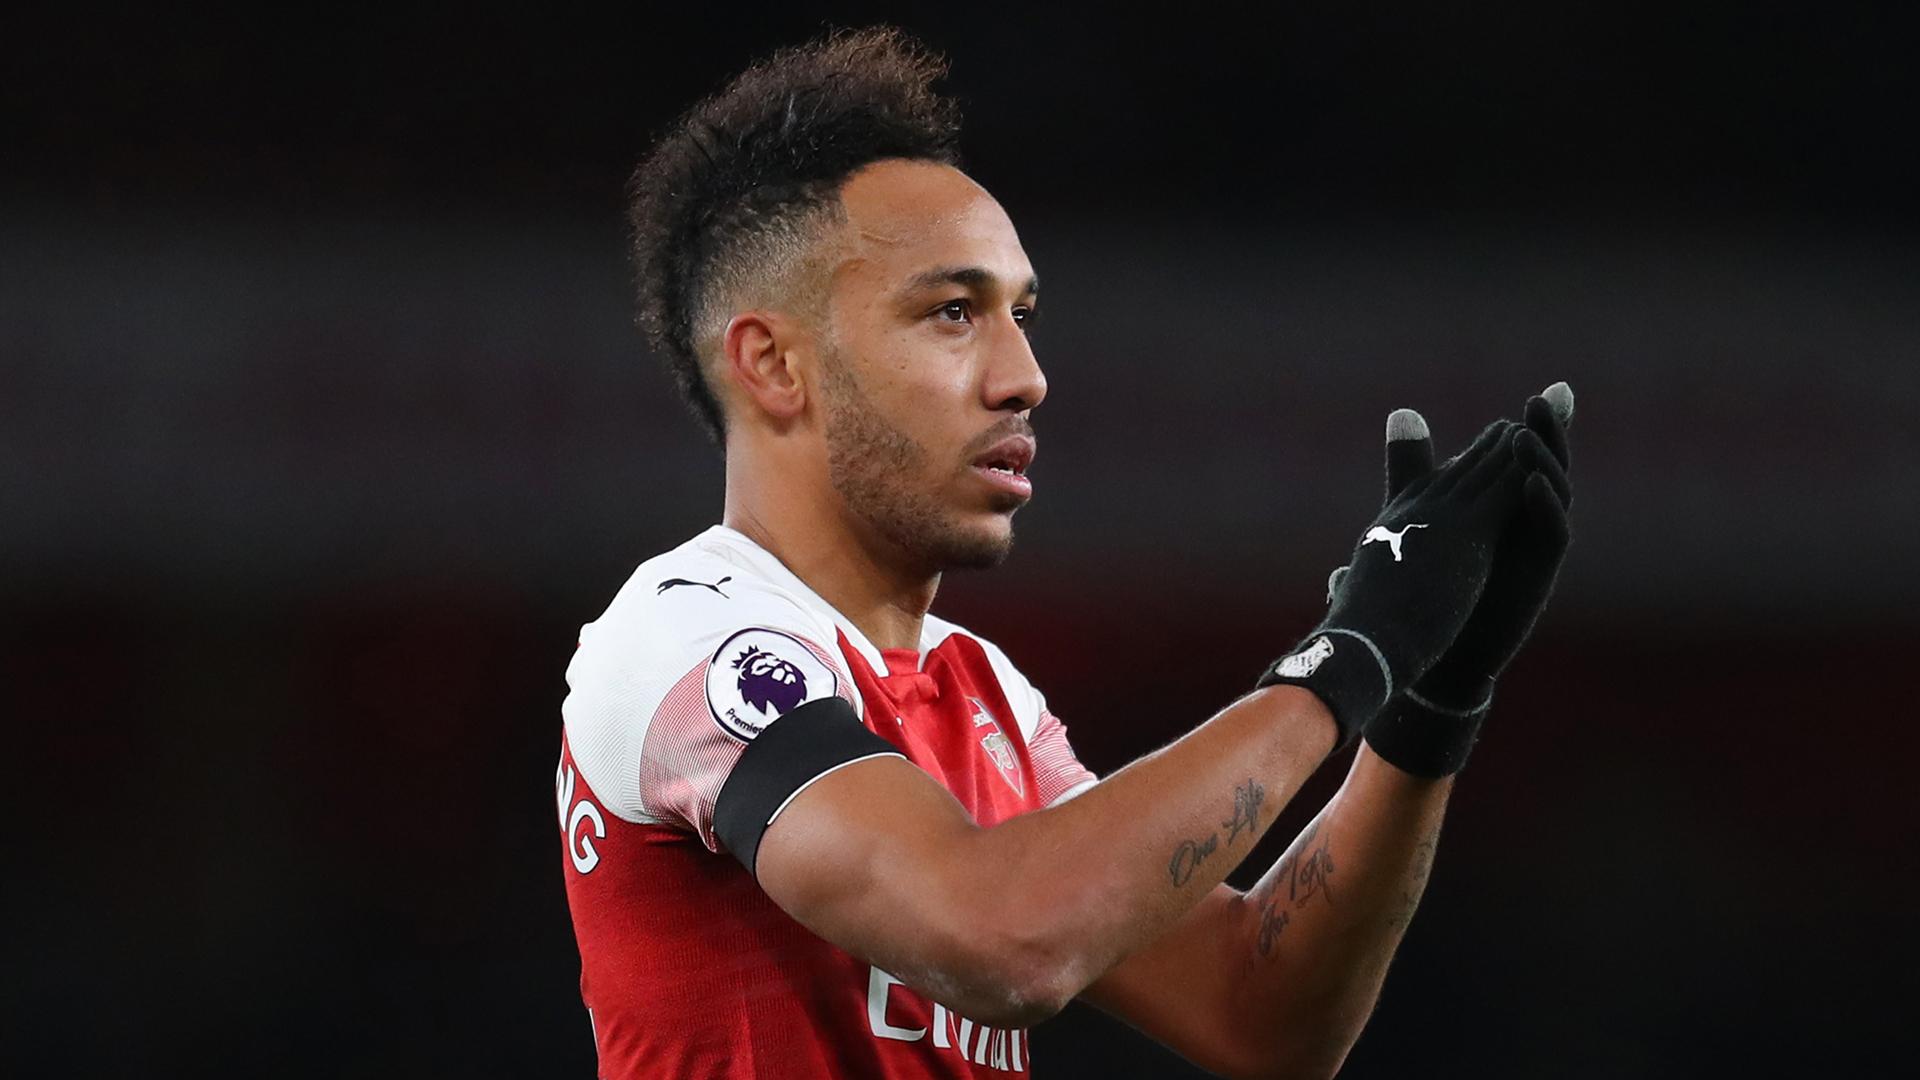 Pierre-Emerick Aubameyang Arsenal 2019